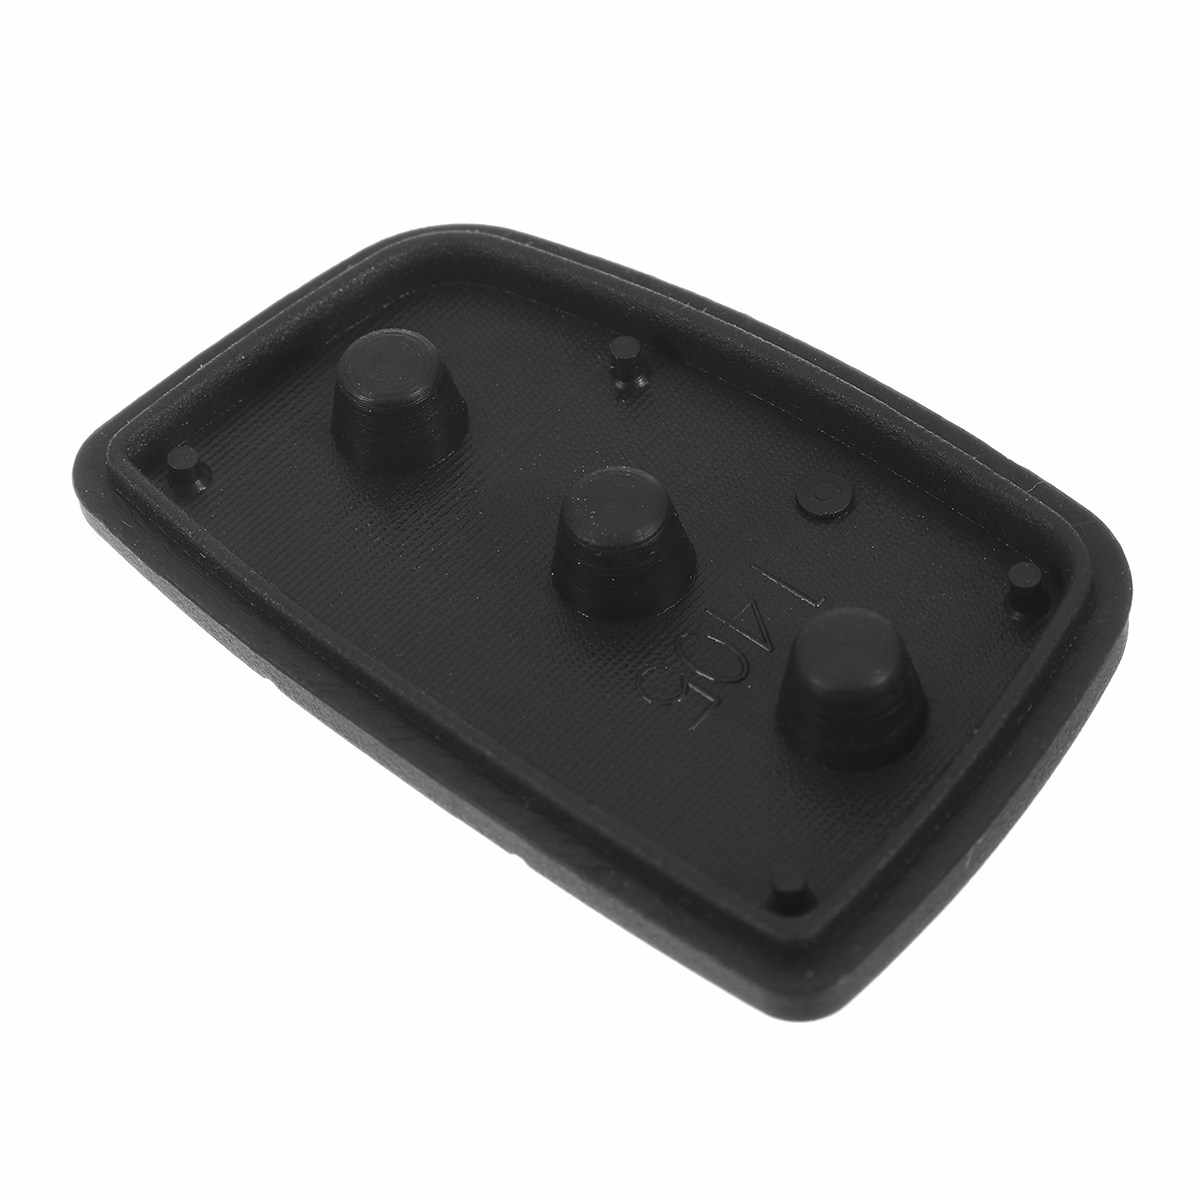 5pcs 3 Knoppen 4 Knoppen Auto Afstandsbediening Sleutel Cover Shell Rubber Key Pad voor Hyundai HB20 Ix35/ ix45 Santa Fe 2013-2014